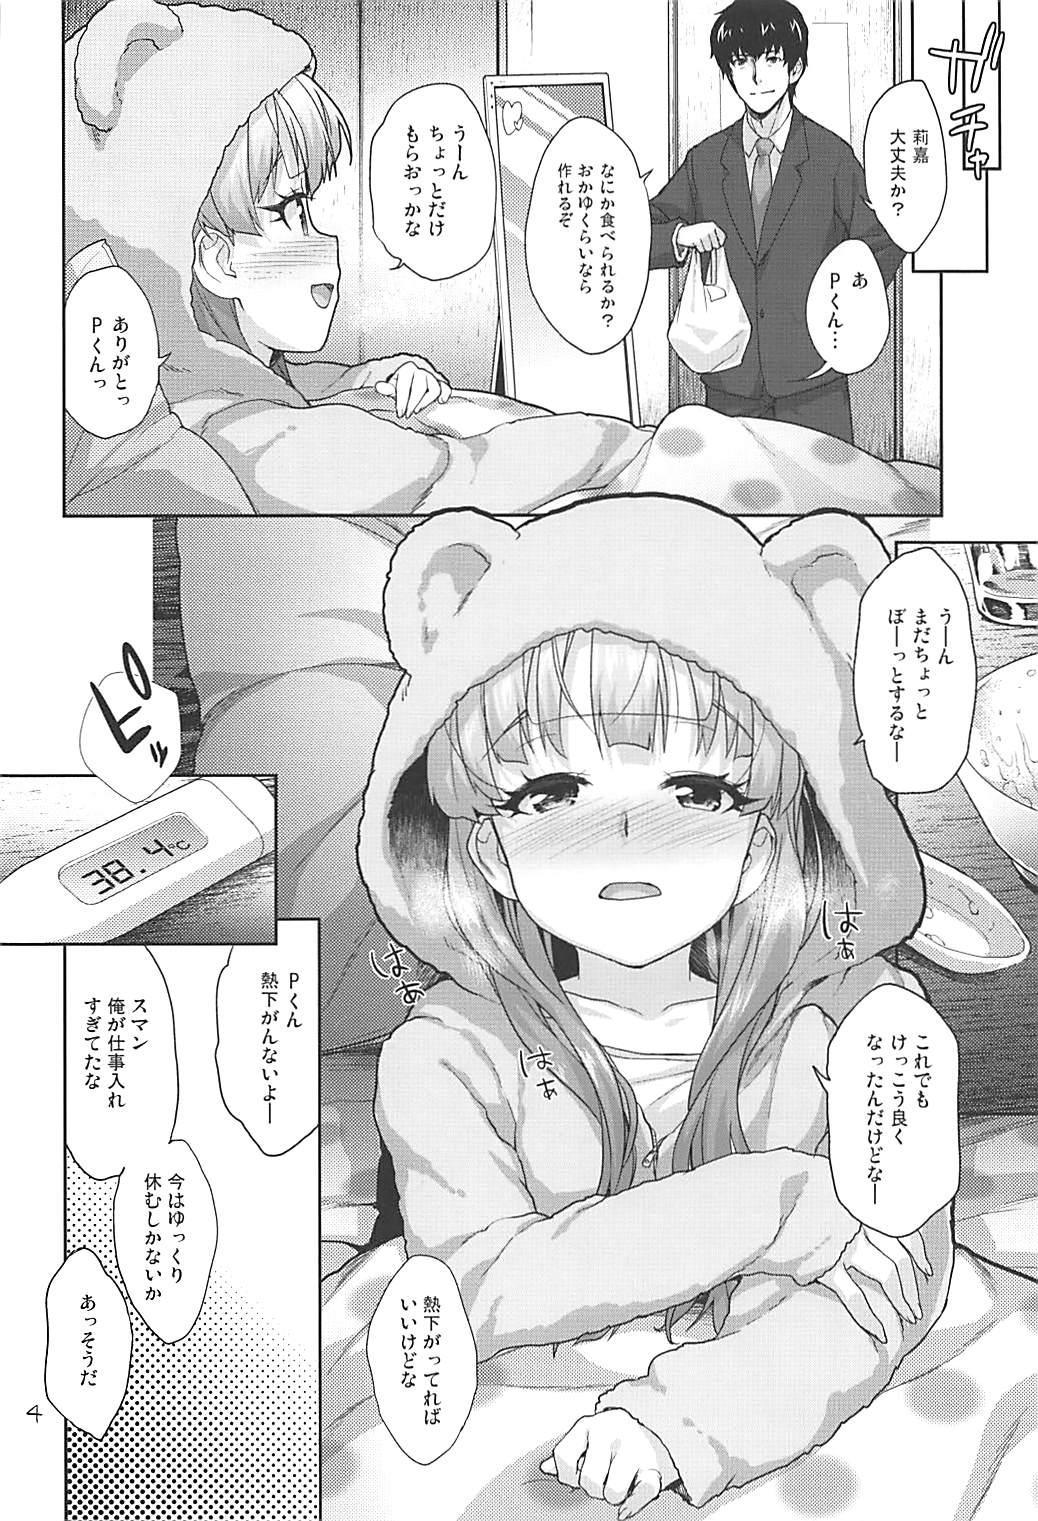 Rika no Oshiri Challenge 2